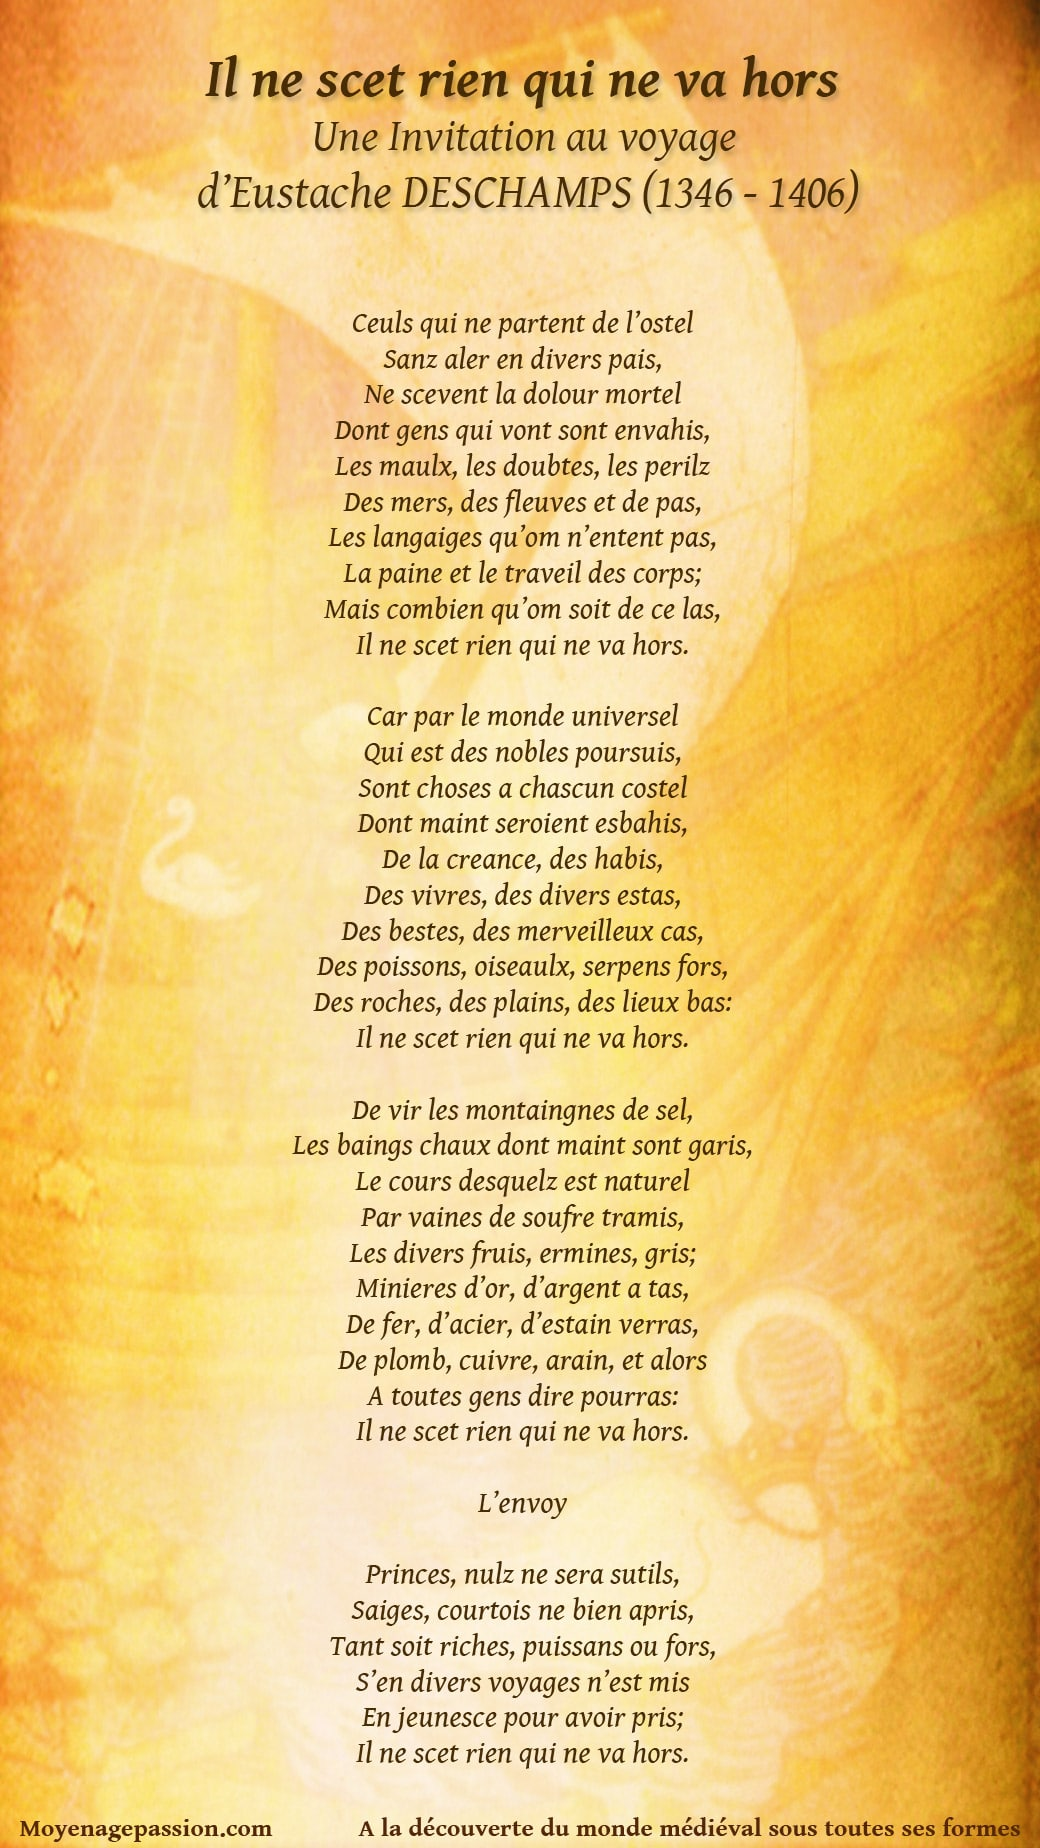 eustache_deschamps_morel_poesie_ballade_medievale_voyage_moyen-age_tardif_XVe